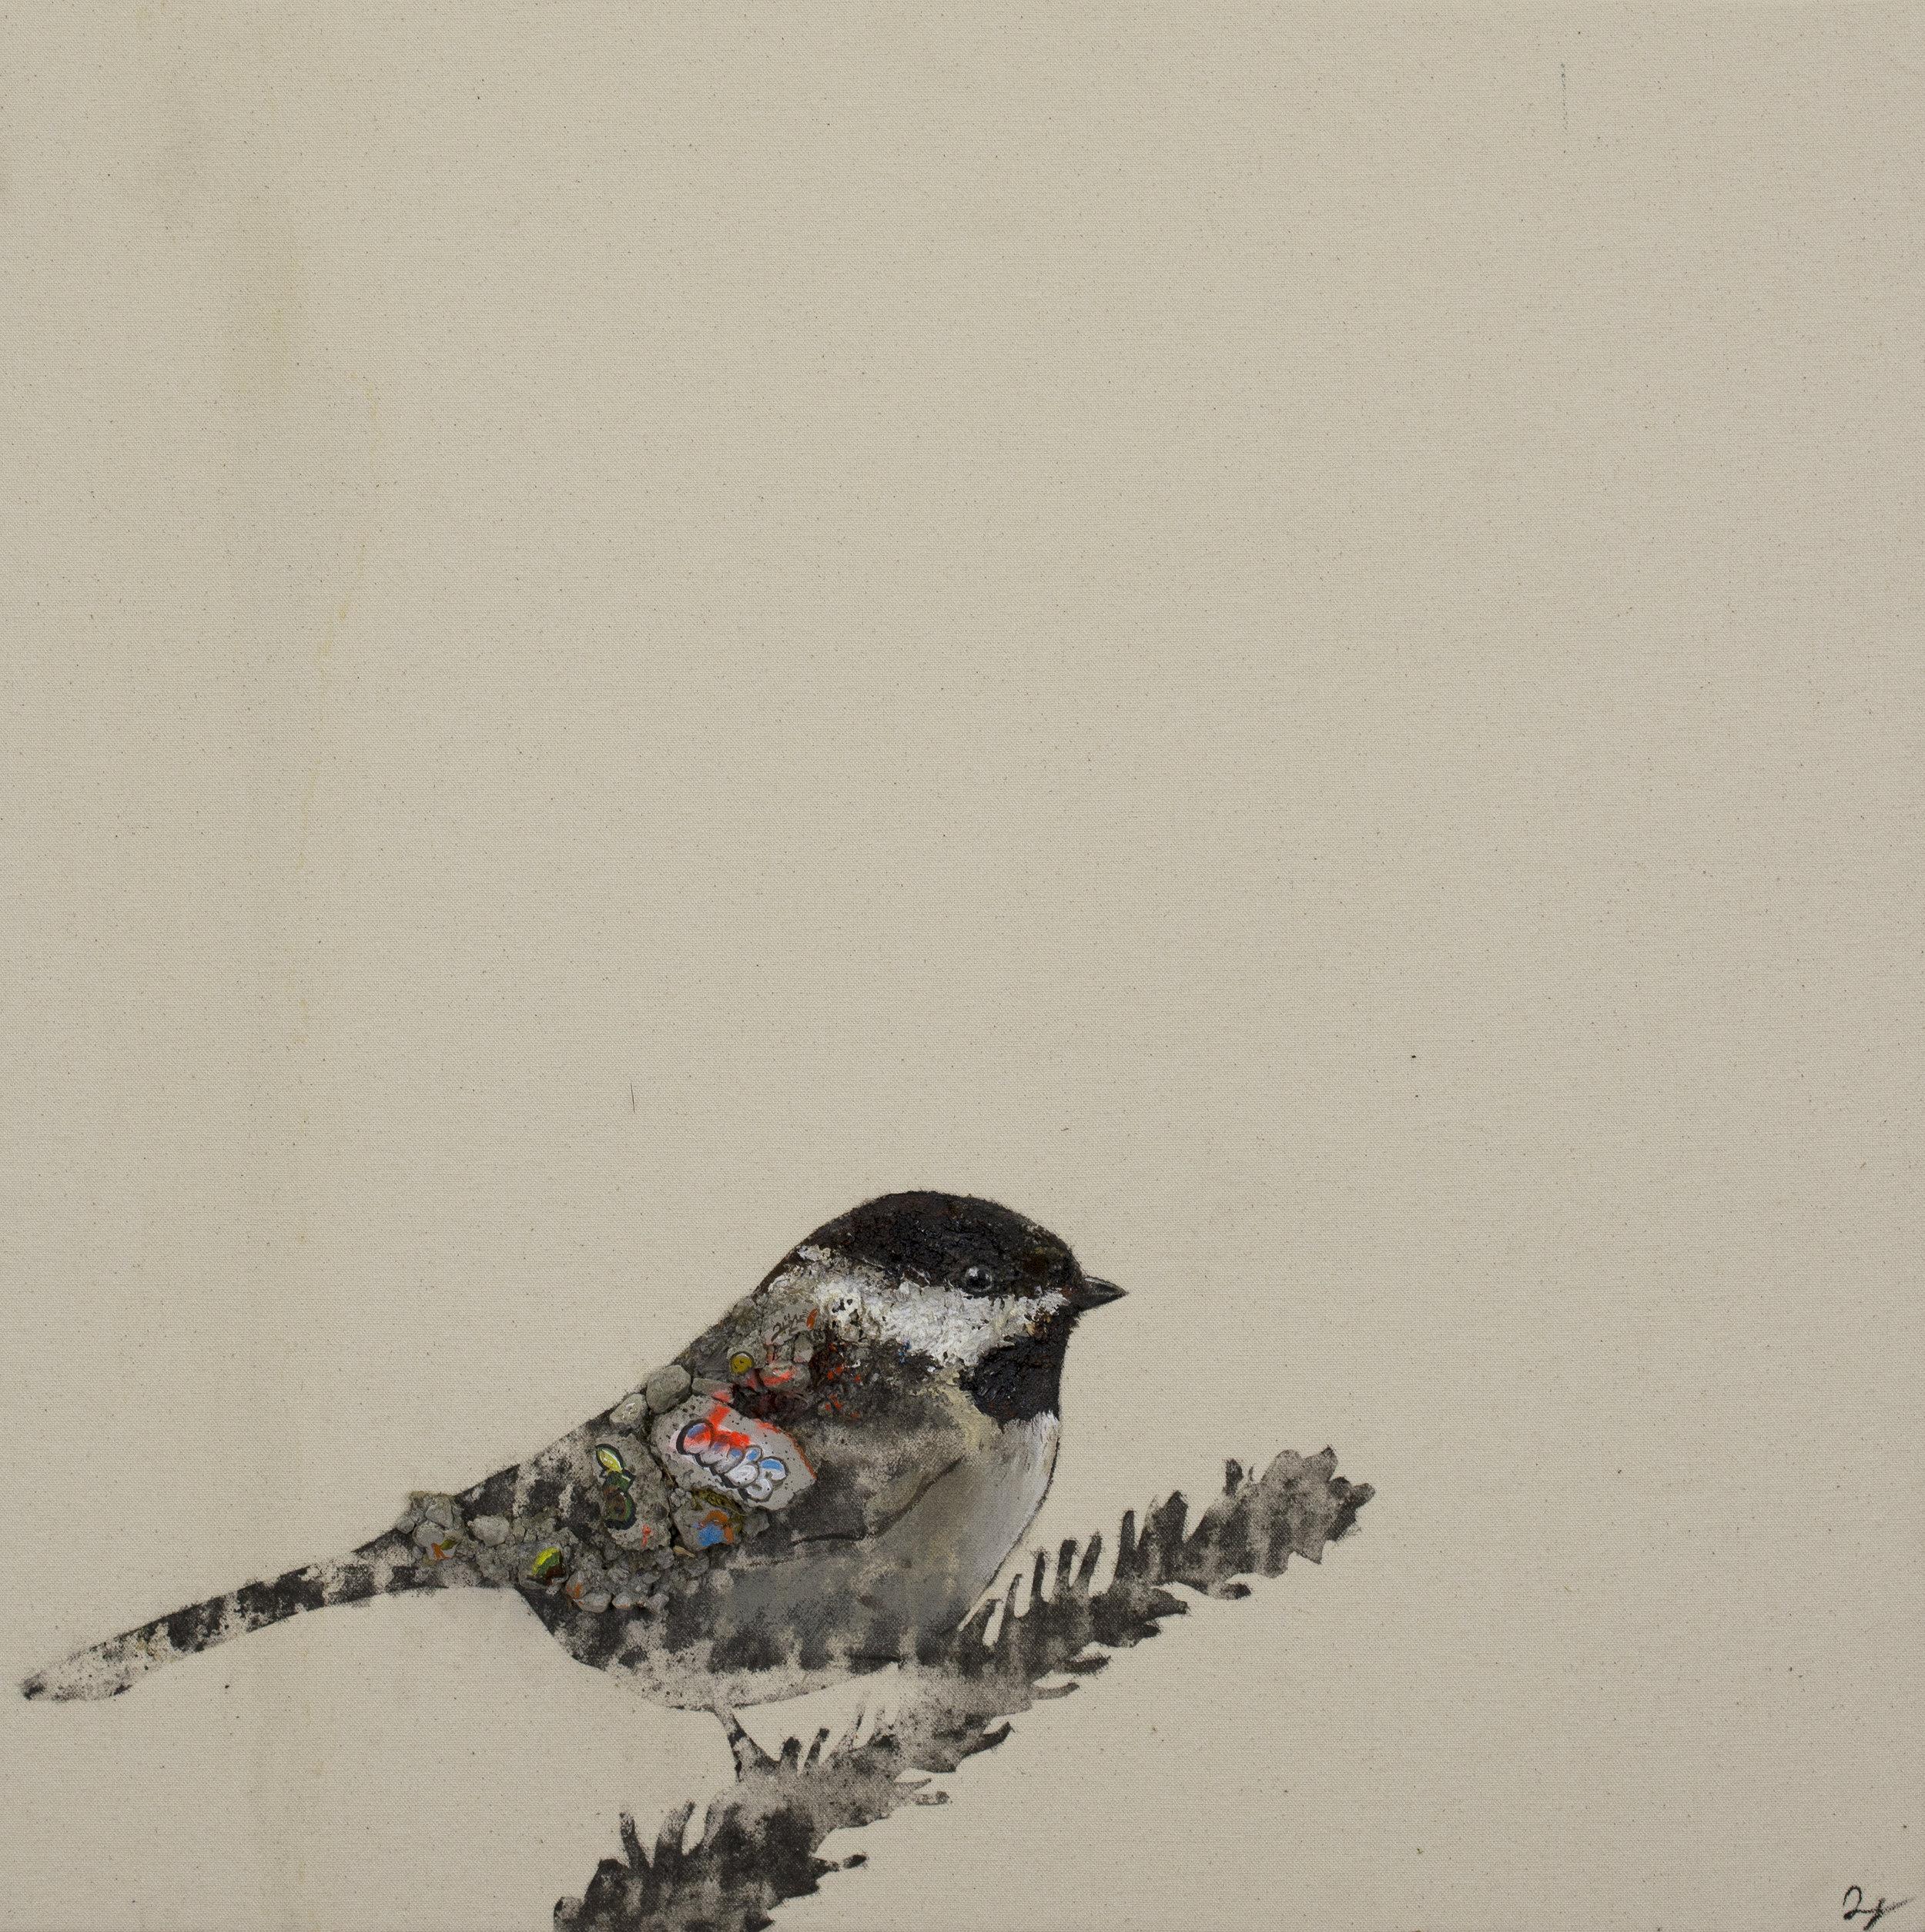 Concrete Jungle, Sparrow